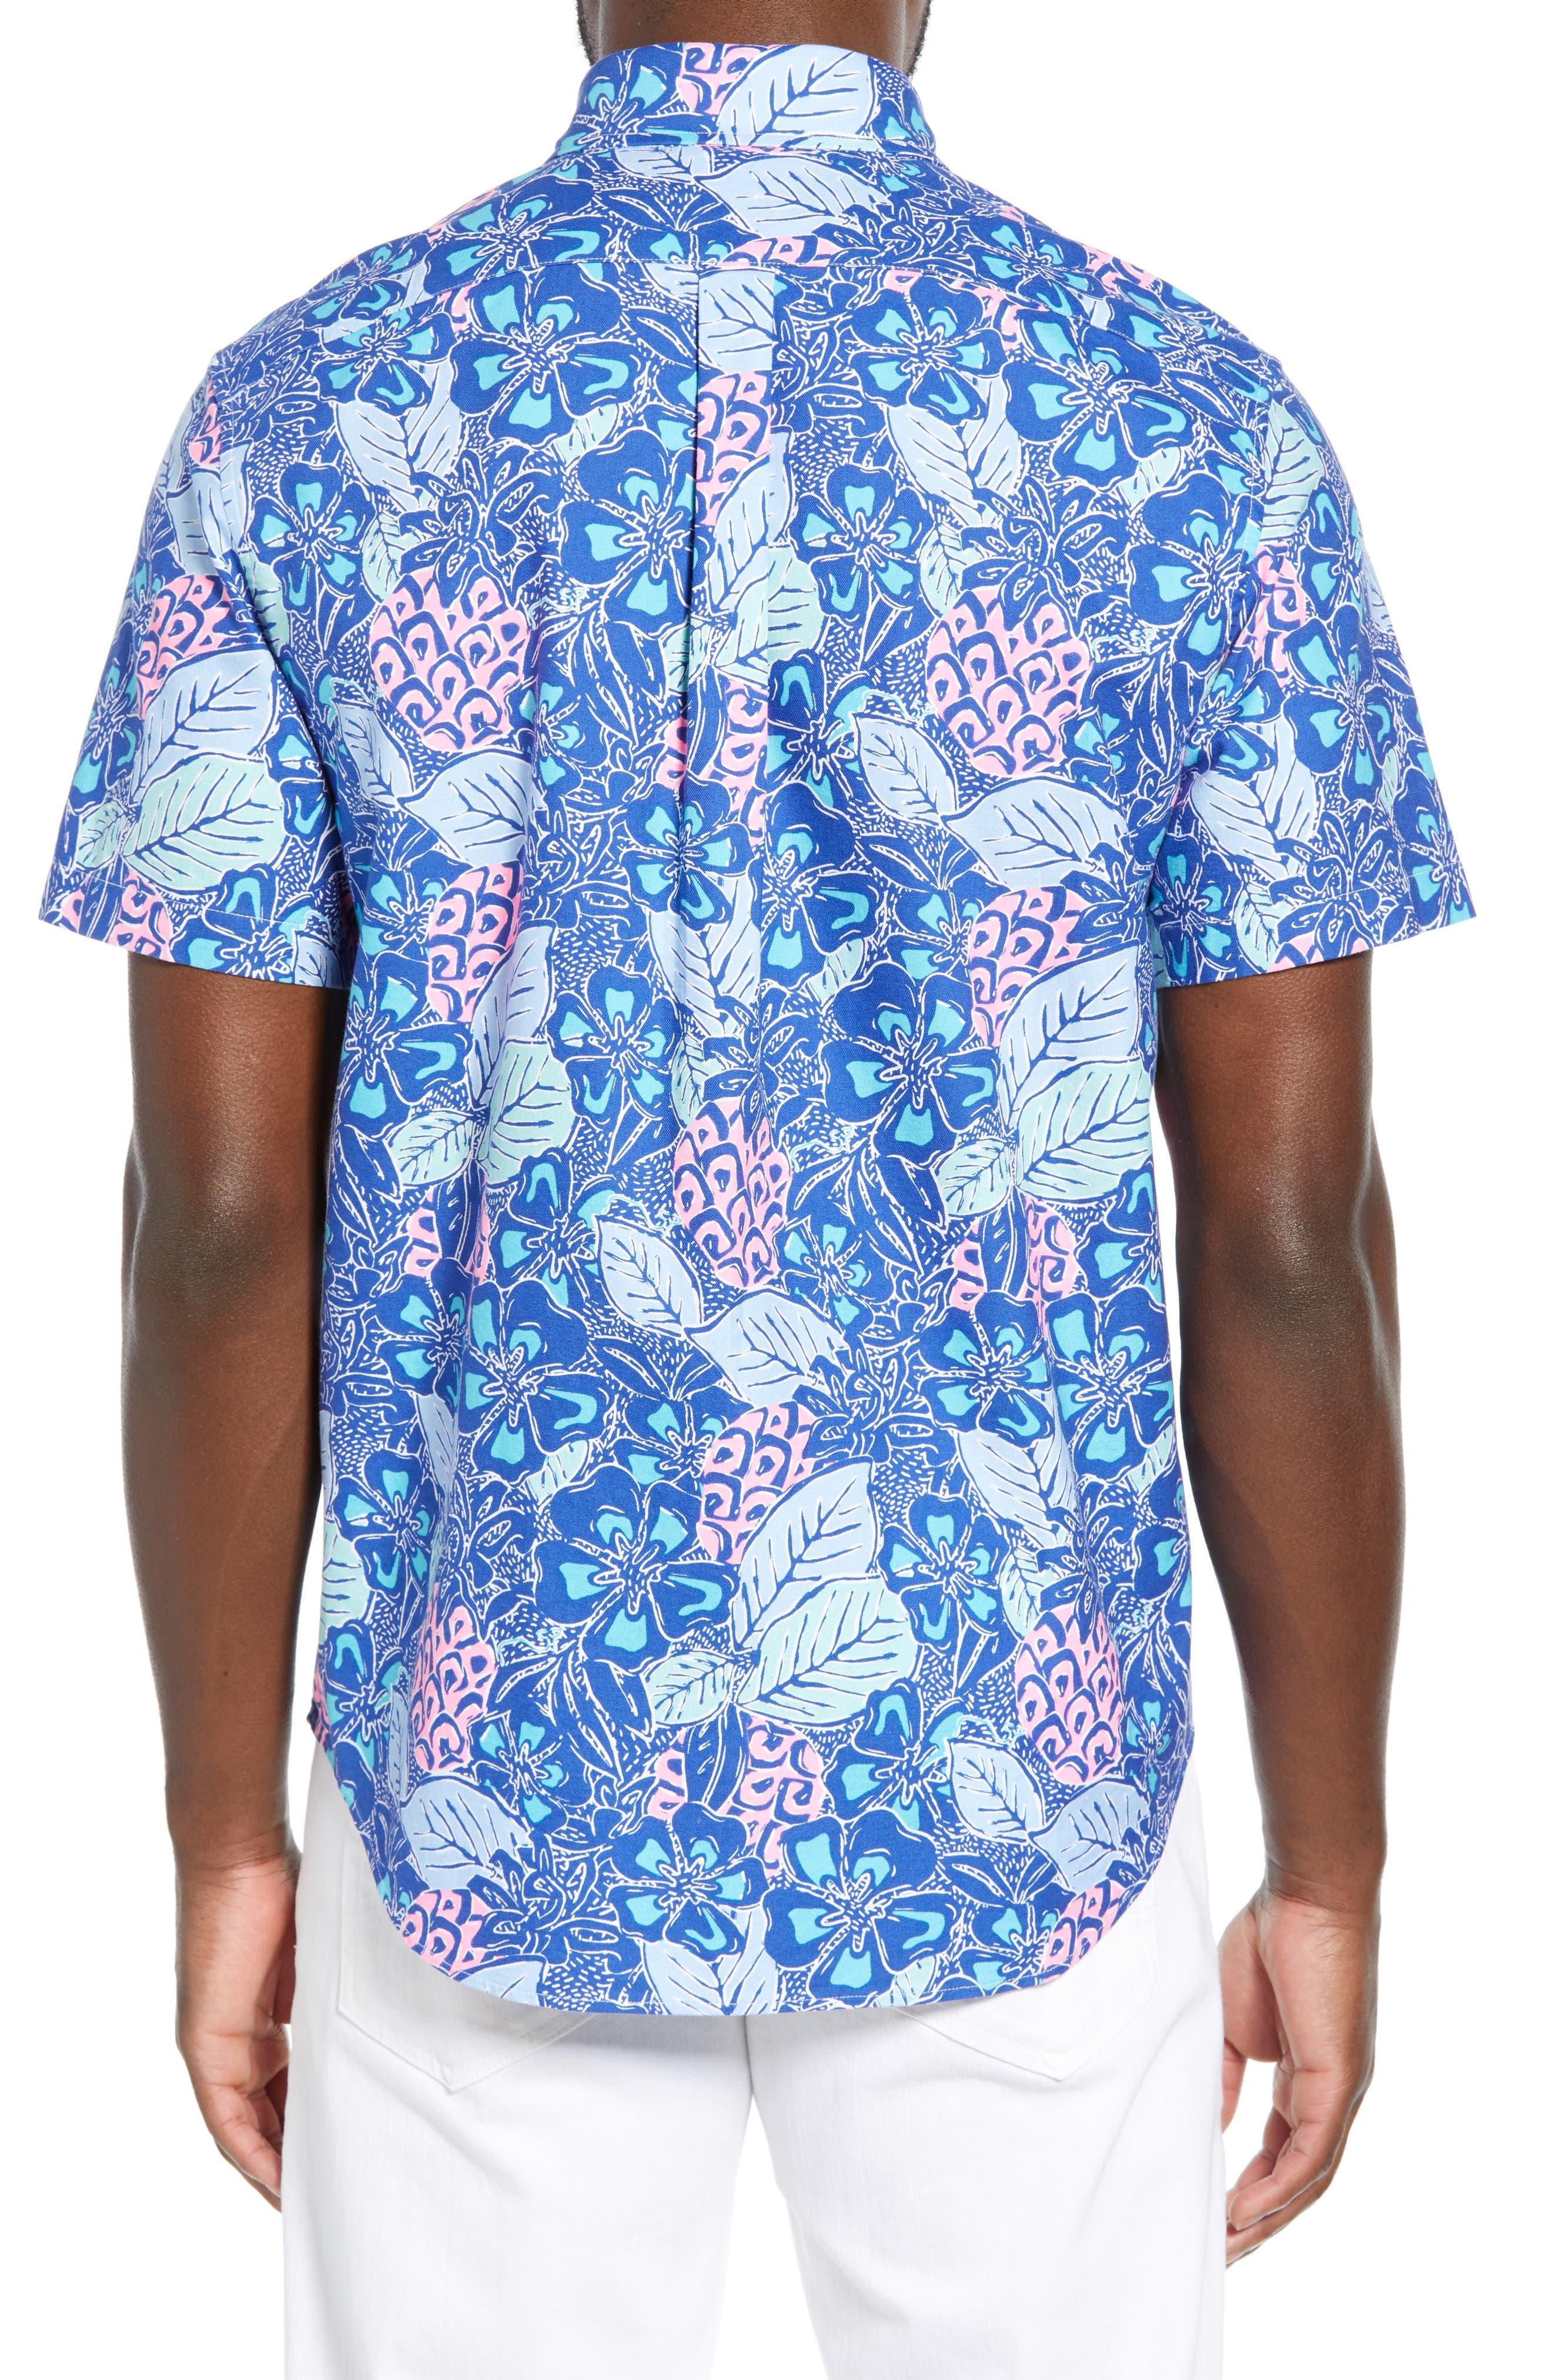 VINEYARD VINES,                             Murray Slim Fit Pineapple Print Sport Shirt,                             Alternate thumbnail 3, color,                             ROYAL OCEAN